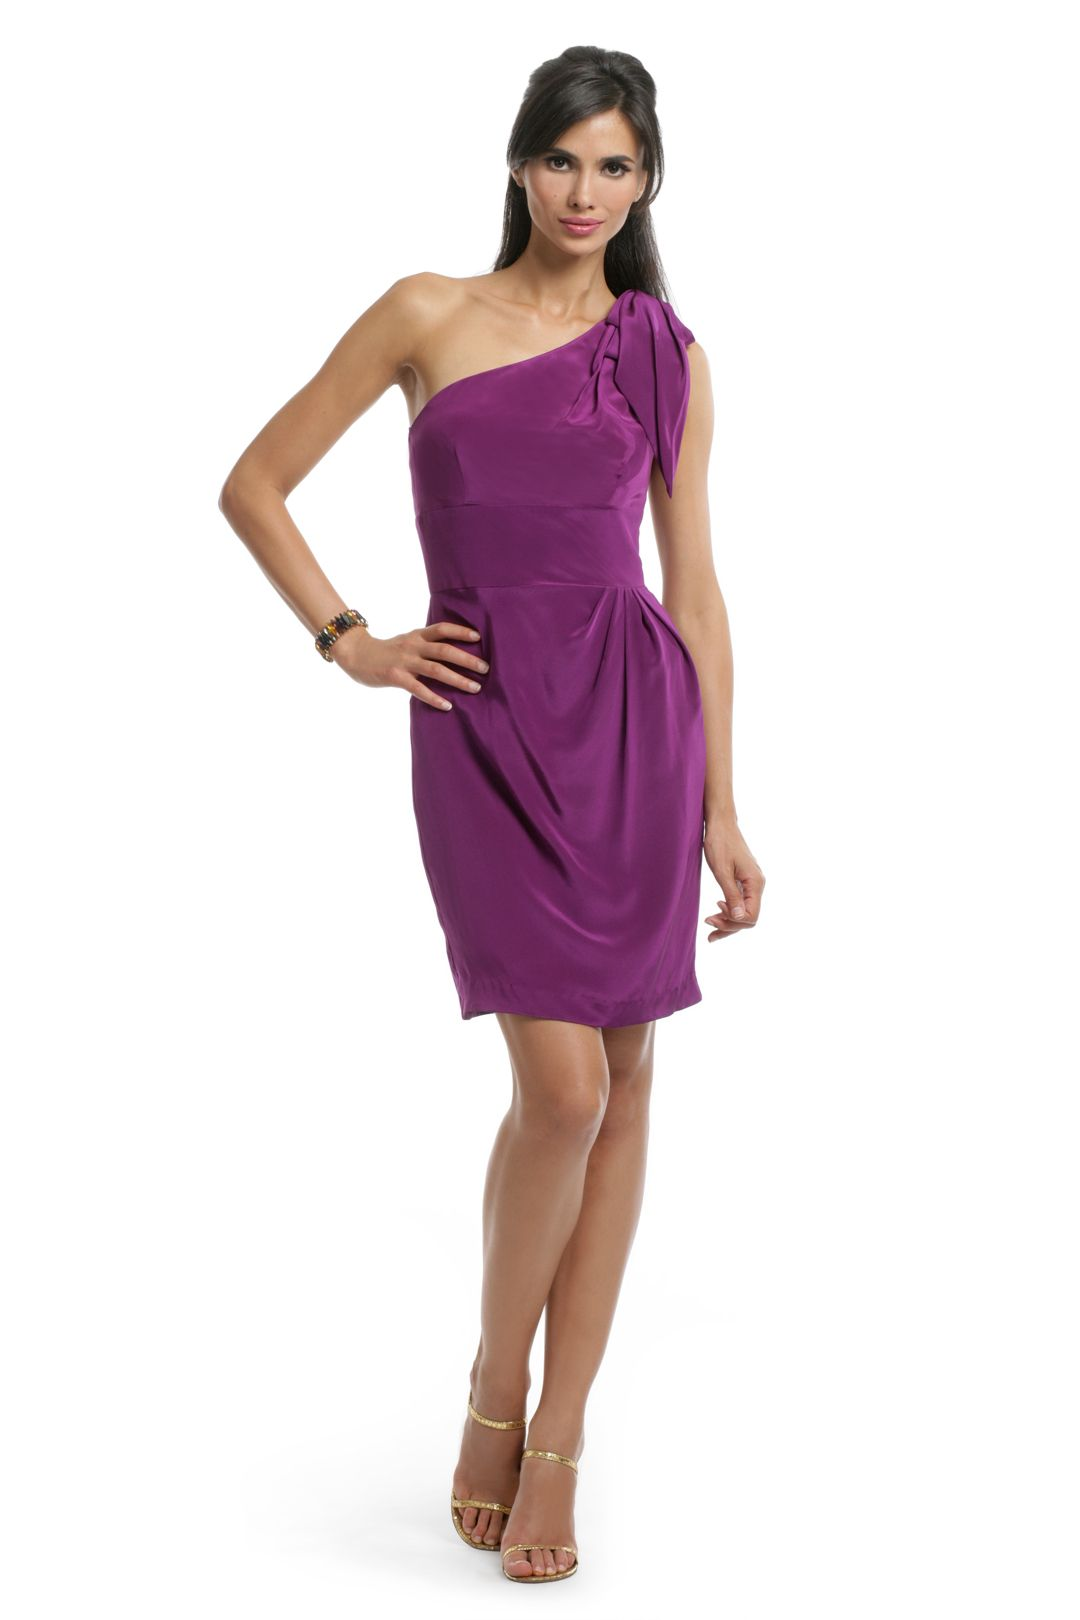 Trina Turk Purple Bow Shoulder dress   Dresses   Pinterest